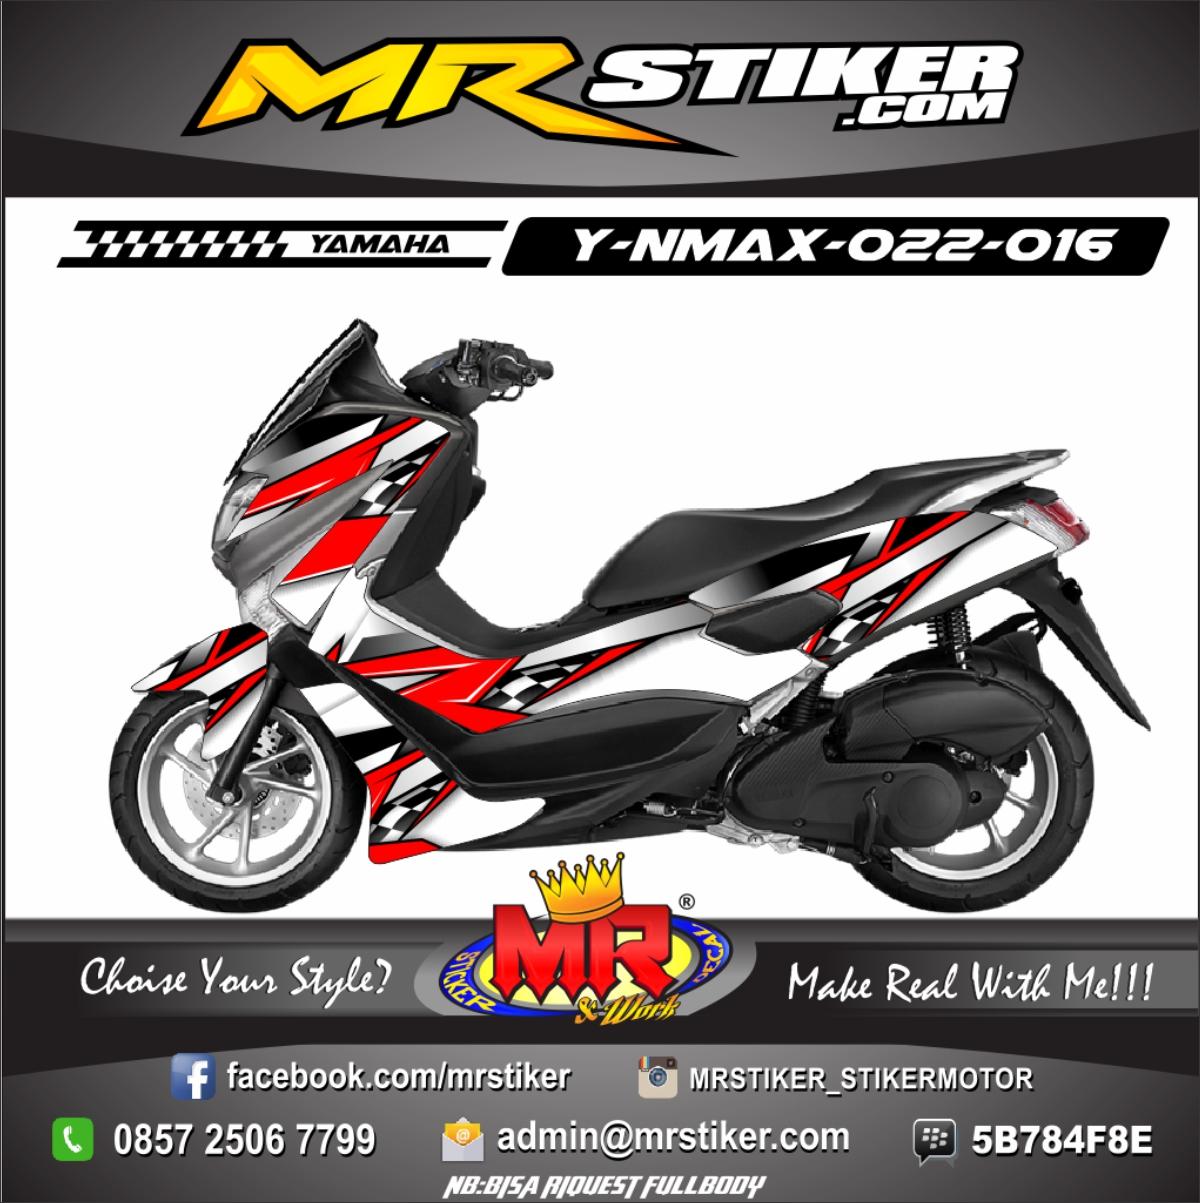 Stiker-Motor-Nmax-racing-hot-red